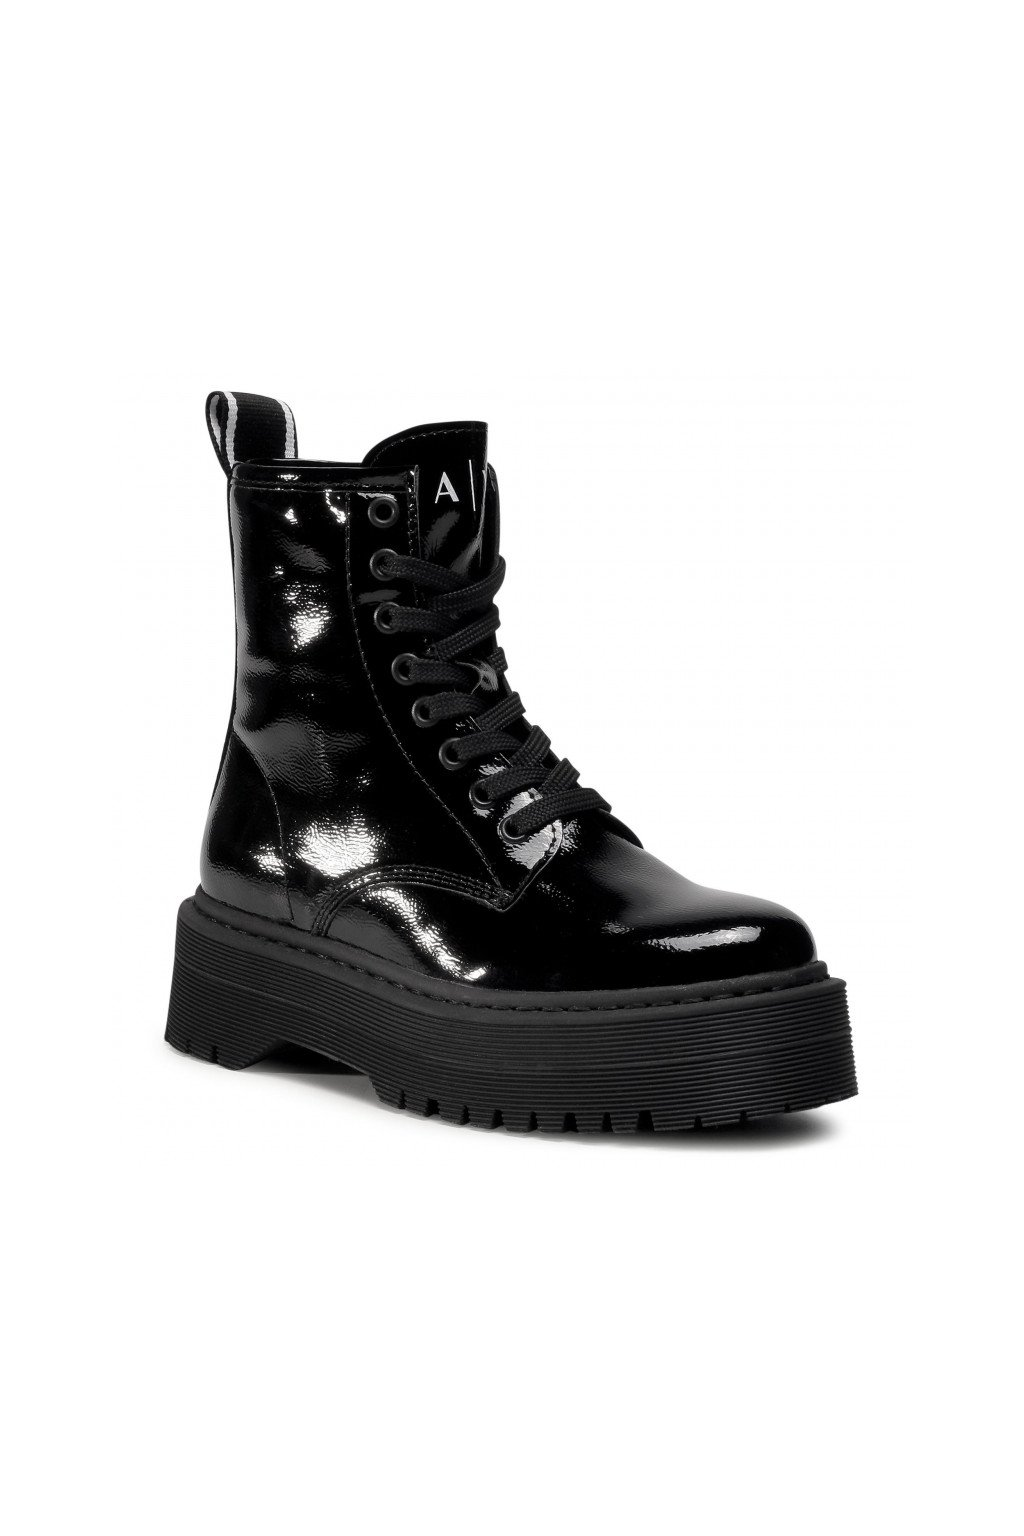 XDN018 XV349 00002 Dámská obuv Armani Exchange XDN018 XV349 černá